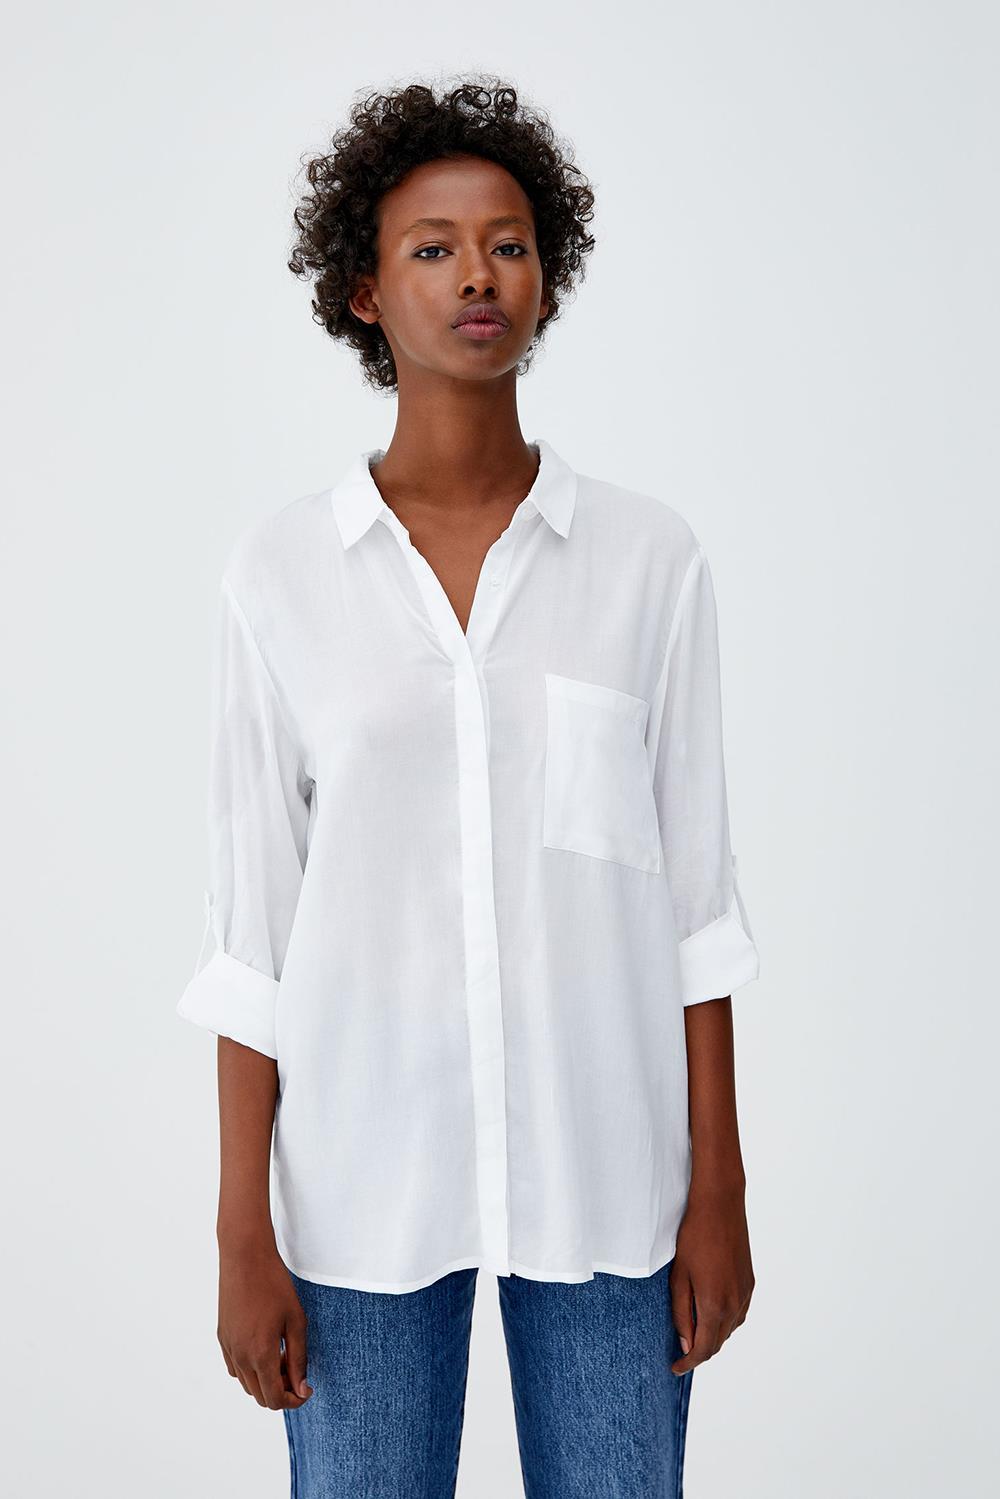 fd2cb06cc 5pull-and-bear-camiseta-blanca-clasica. Empecemos por la clásica